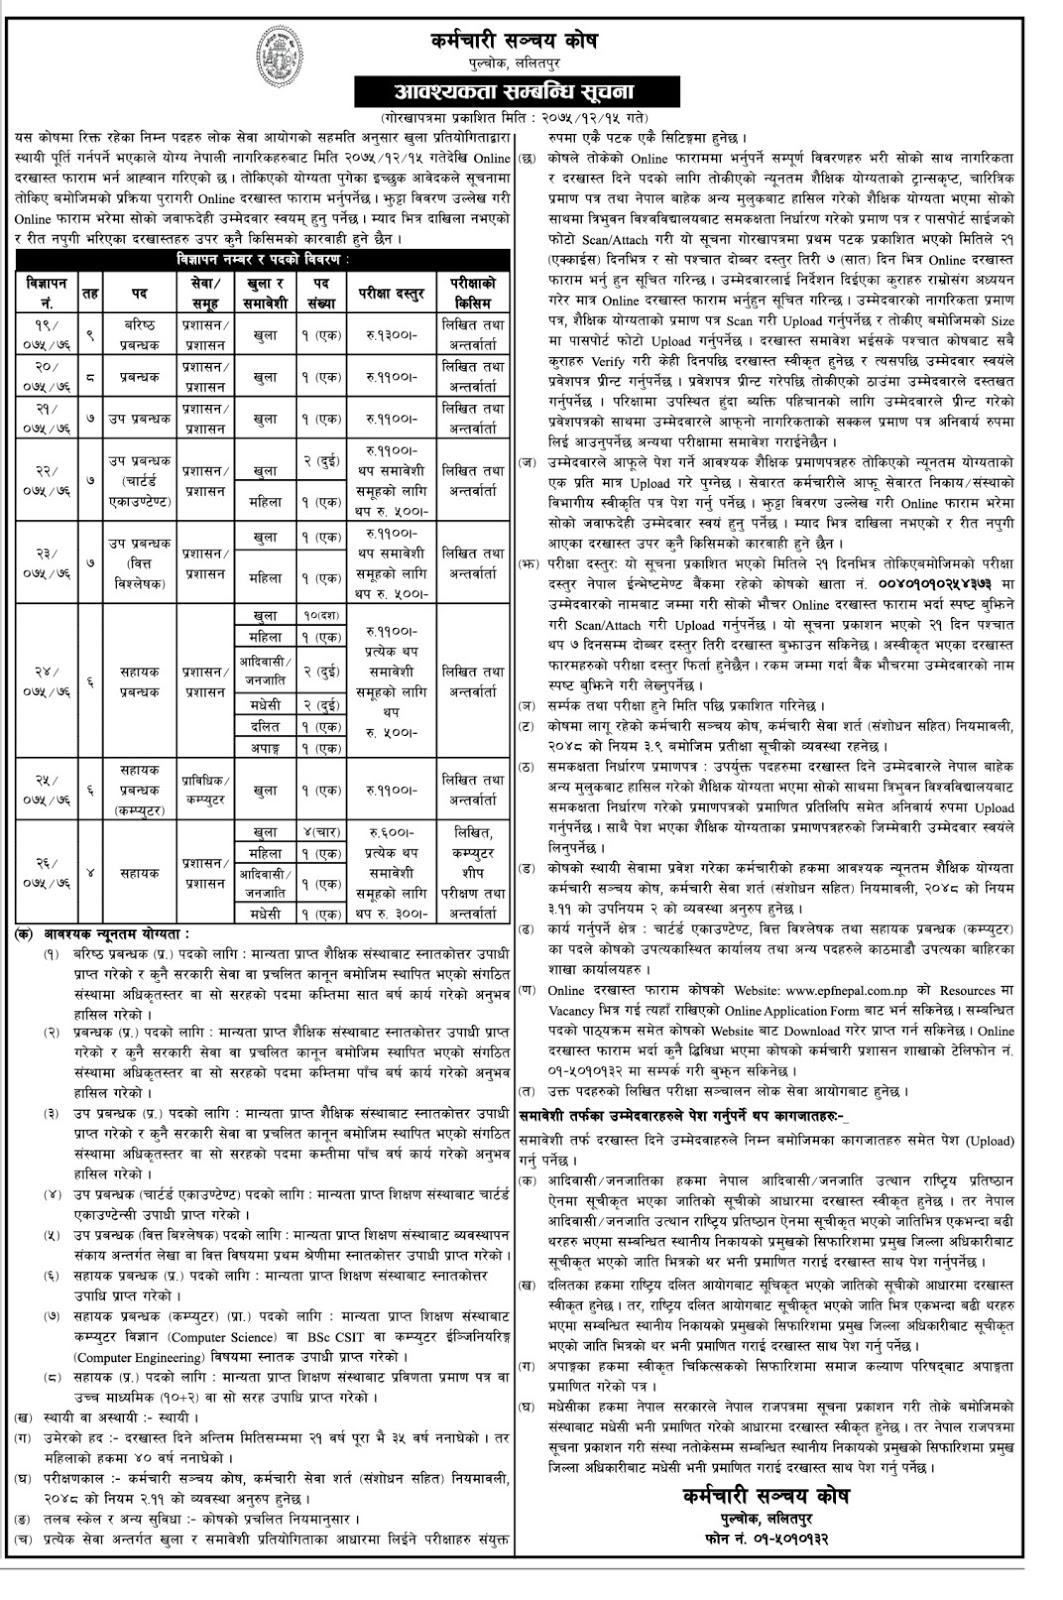 Karmachari Sanchaya Kosh Announced A lot Vacancies On Various Post